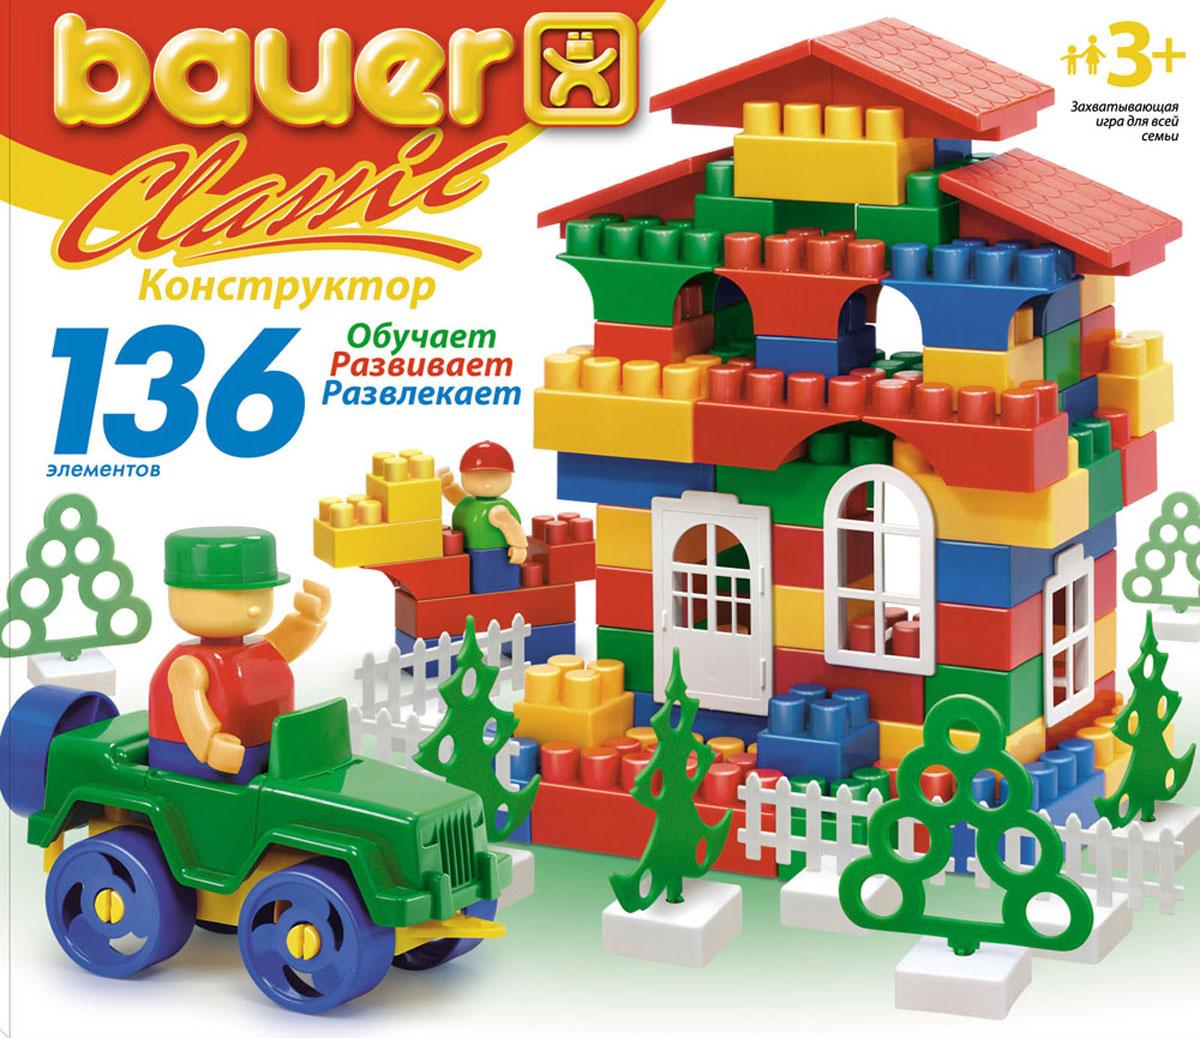 Bauer Конструктор Classic 197 lego classic конструктор дополнение к набору для творчества яркие цвета 10693